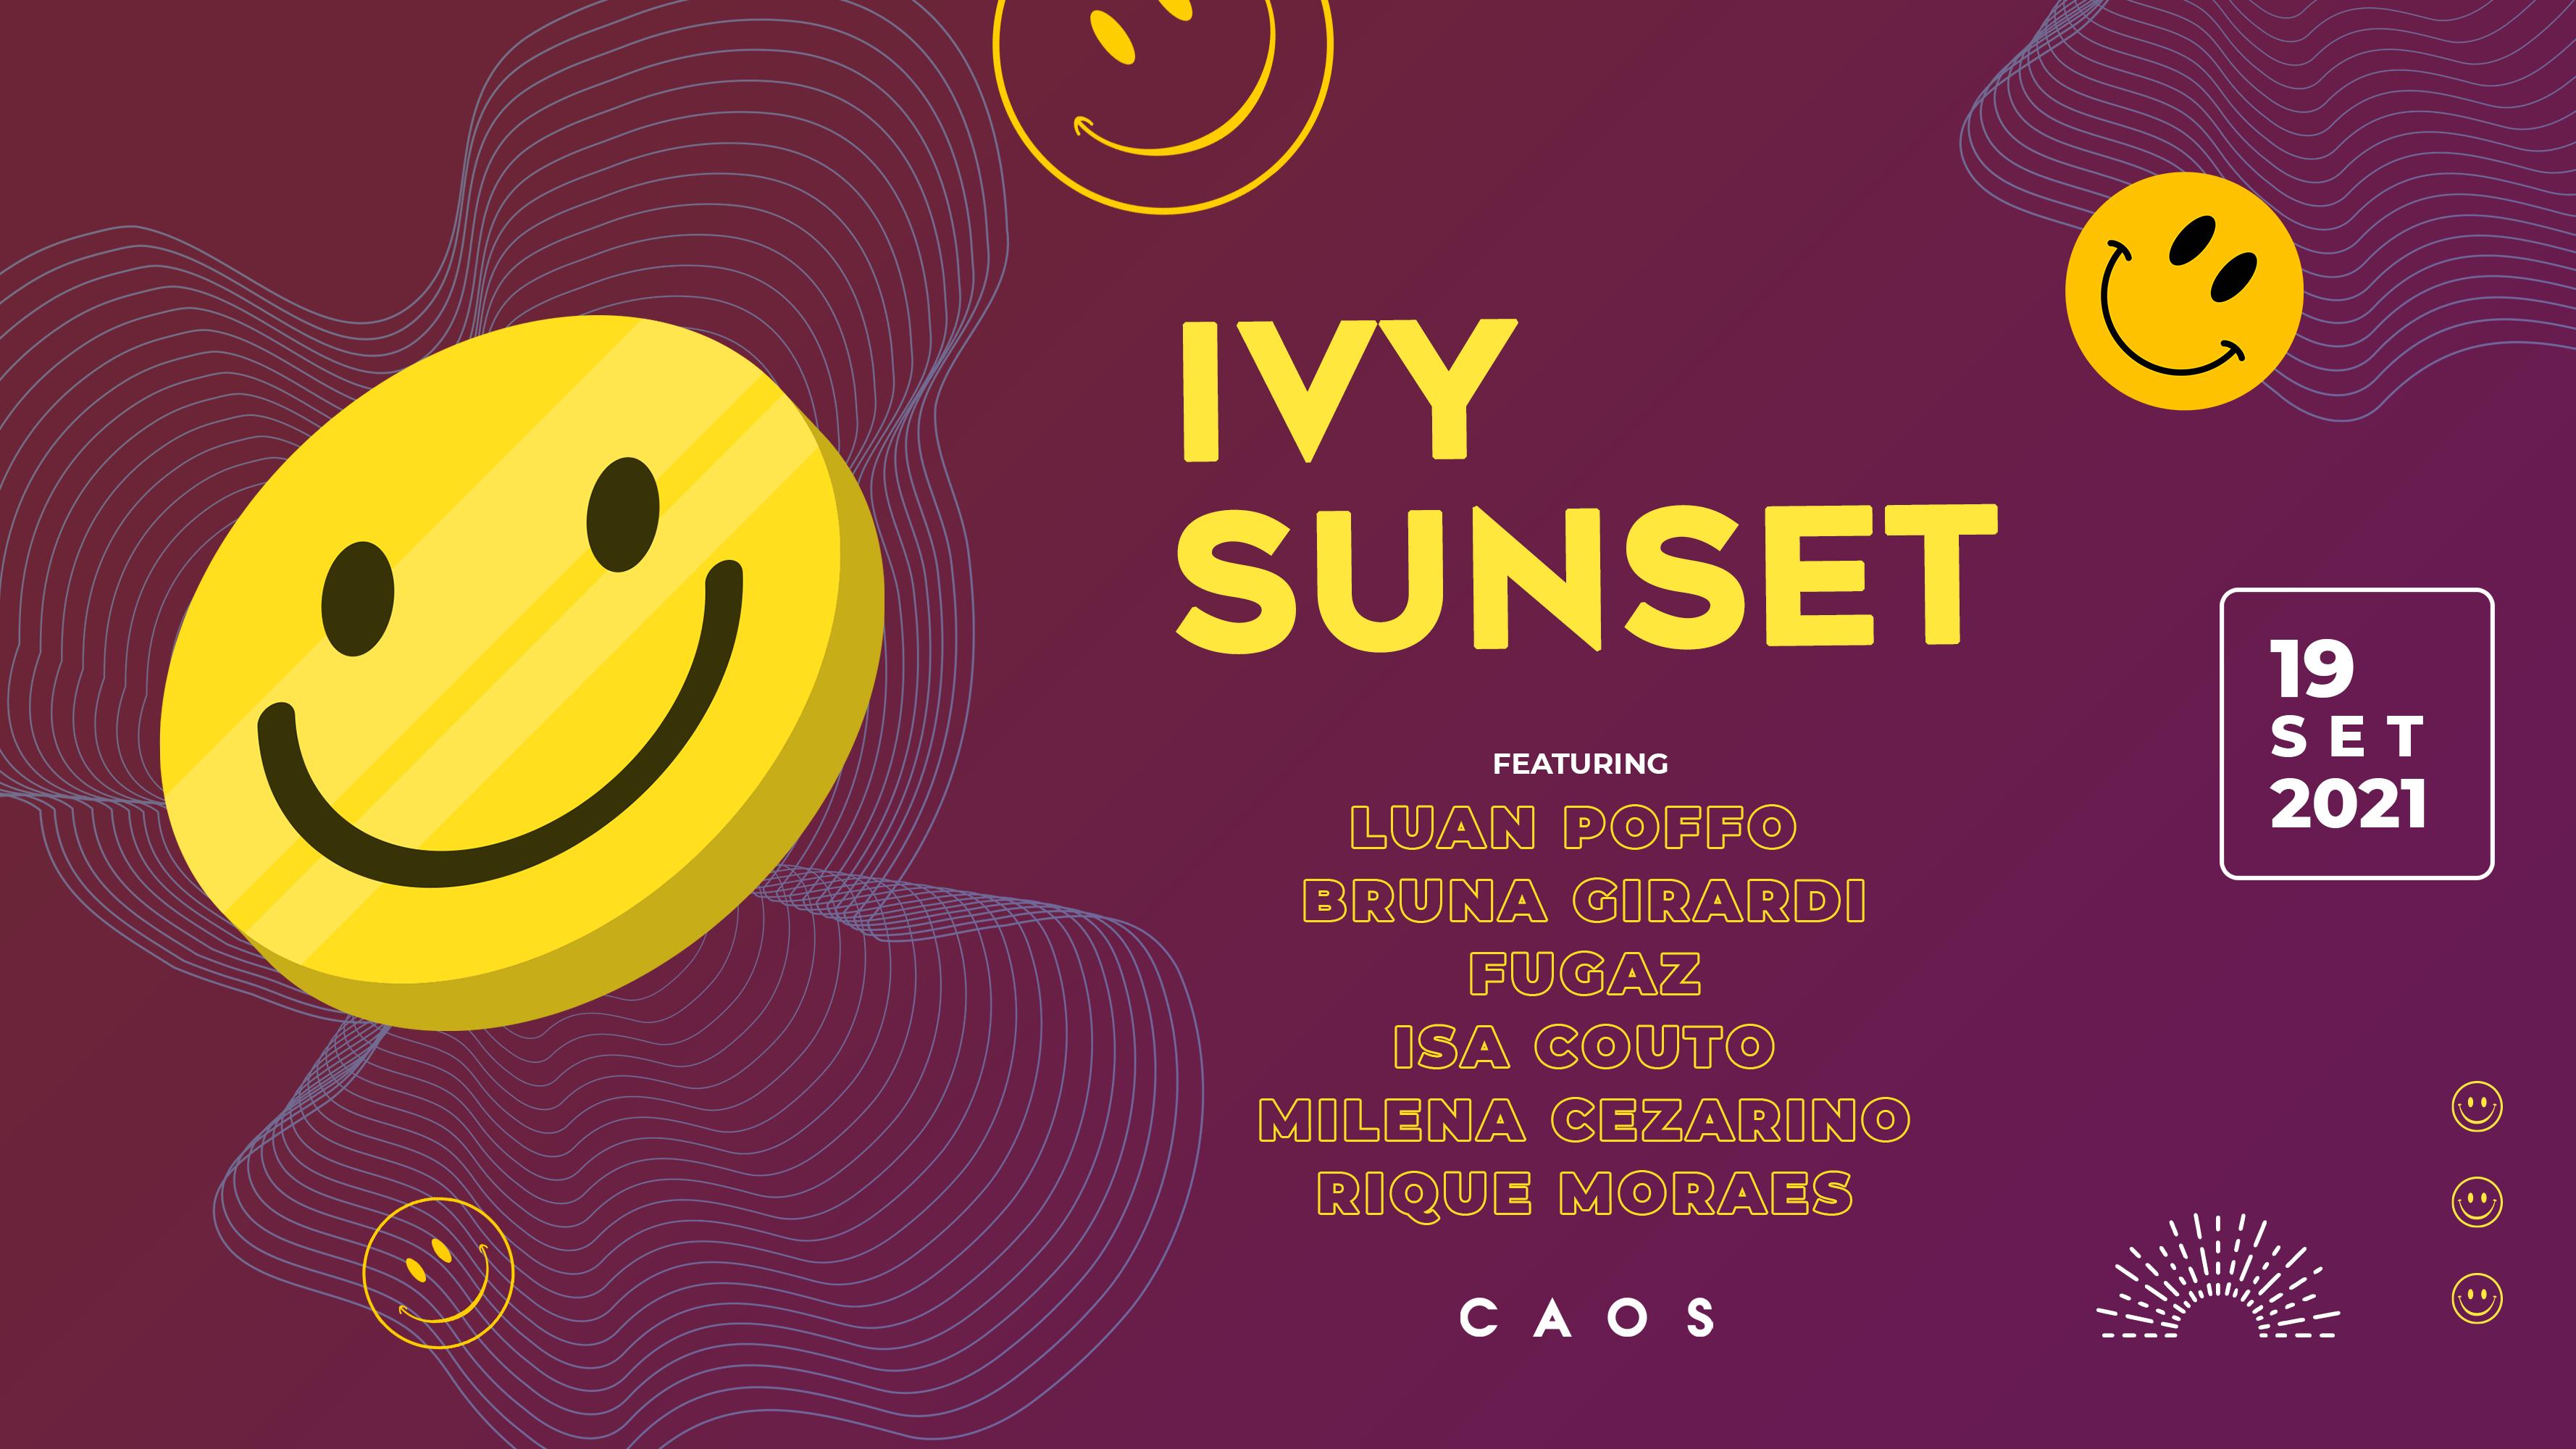 Ivy Sunset apresenta Luan Poffo